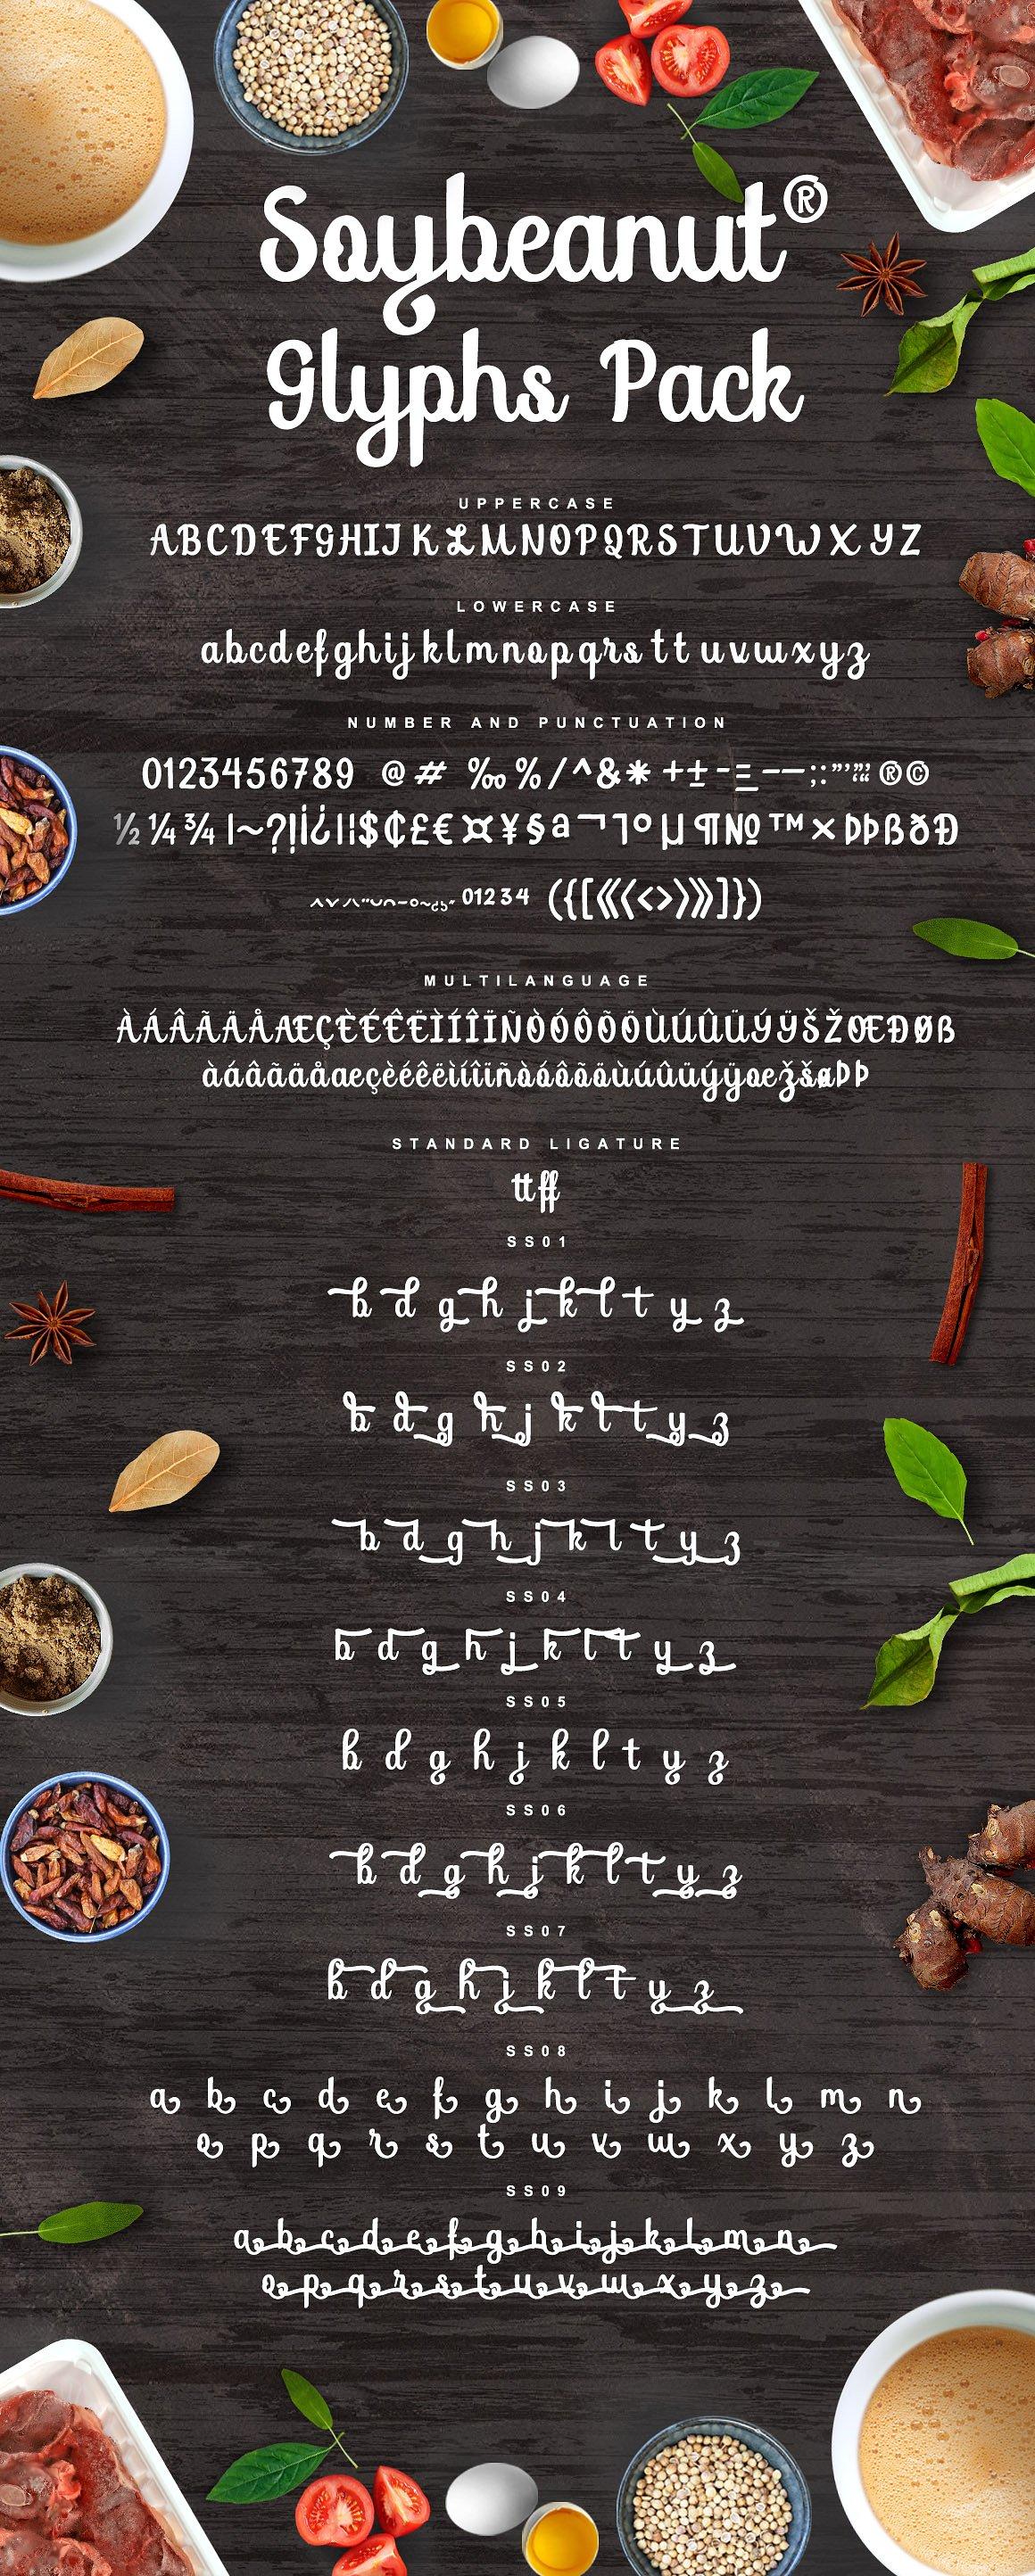 soybeanut-script-font-1